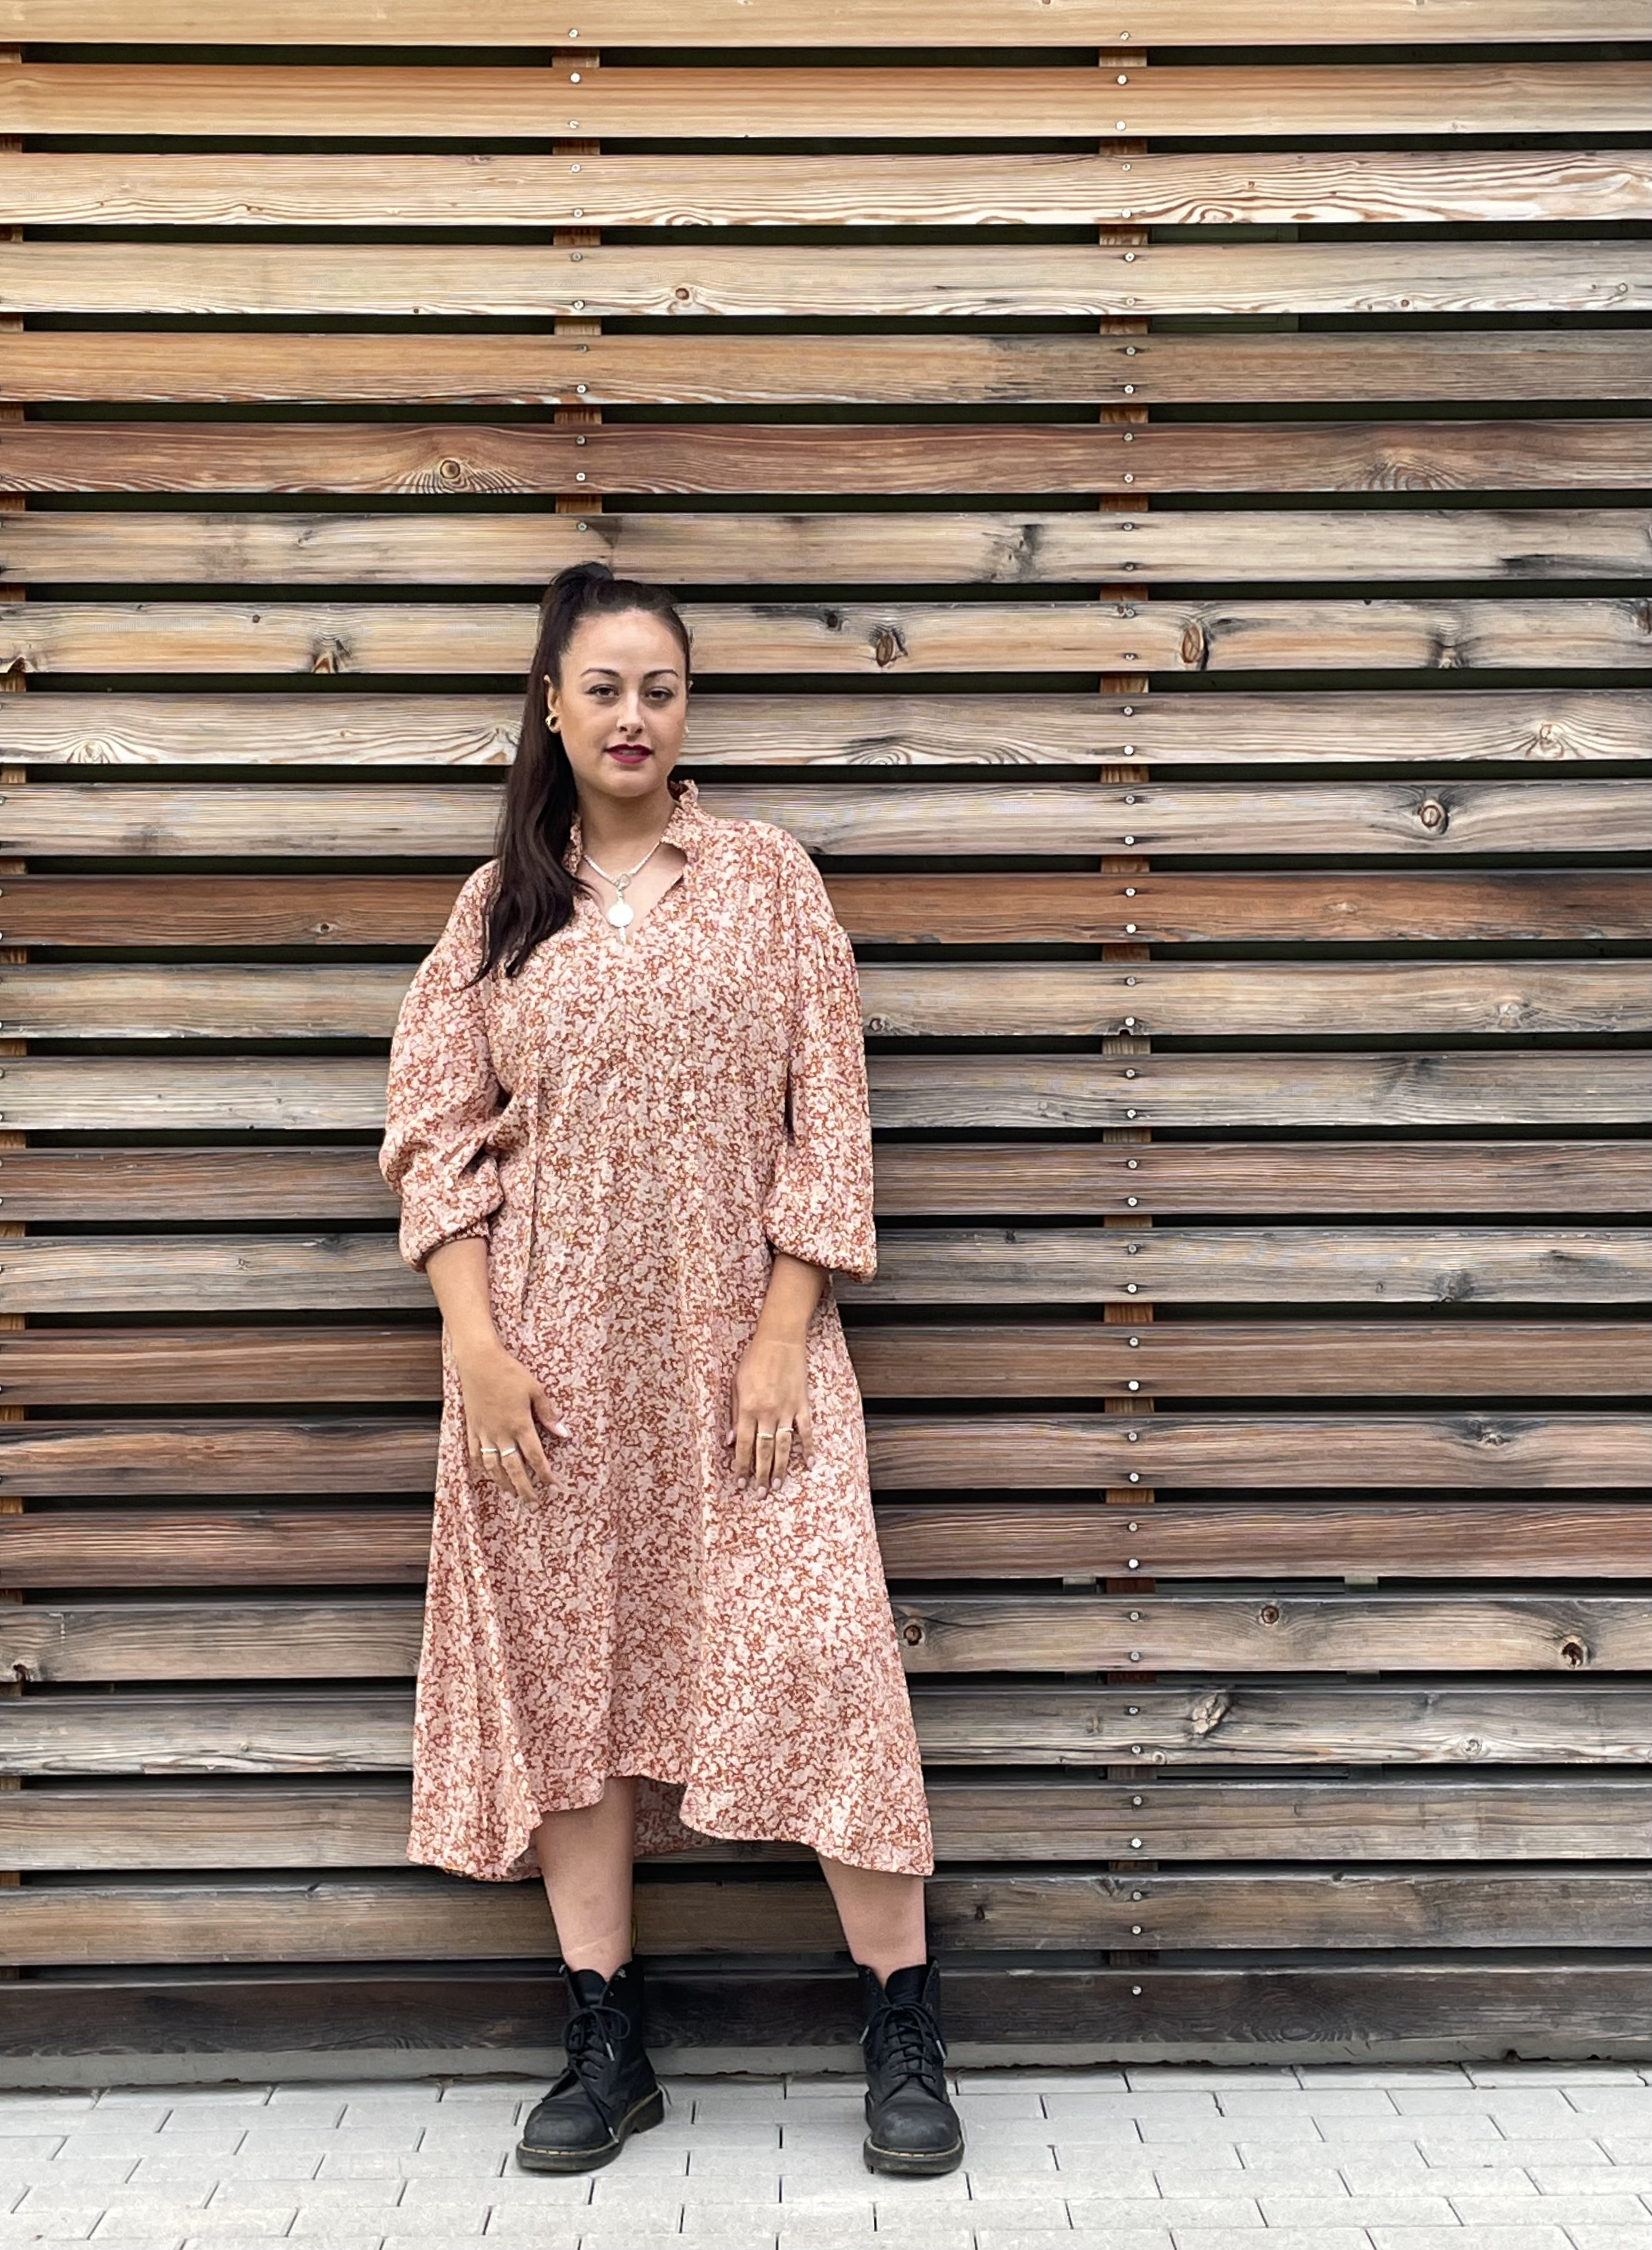 Kleid July - JcSophie